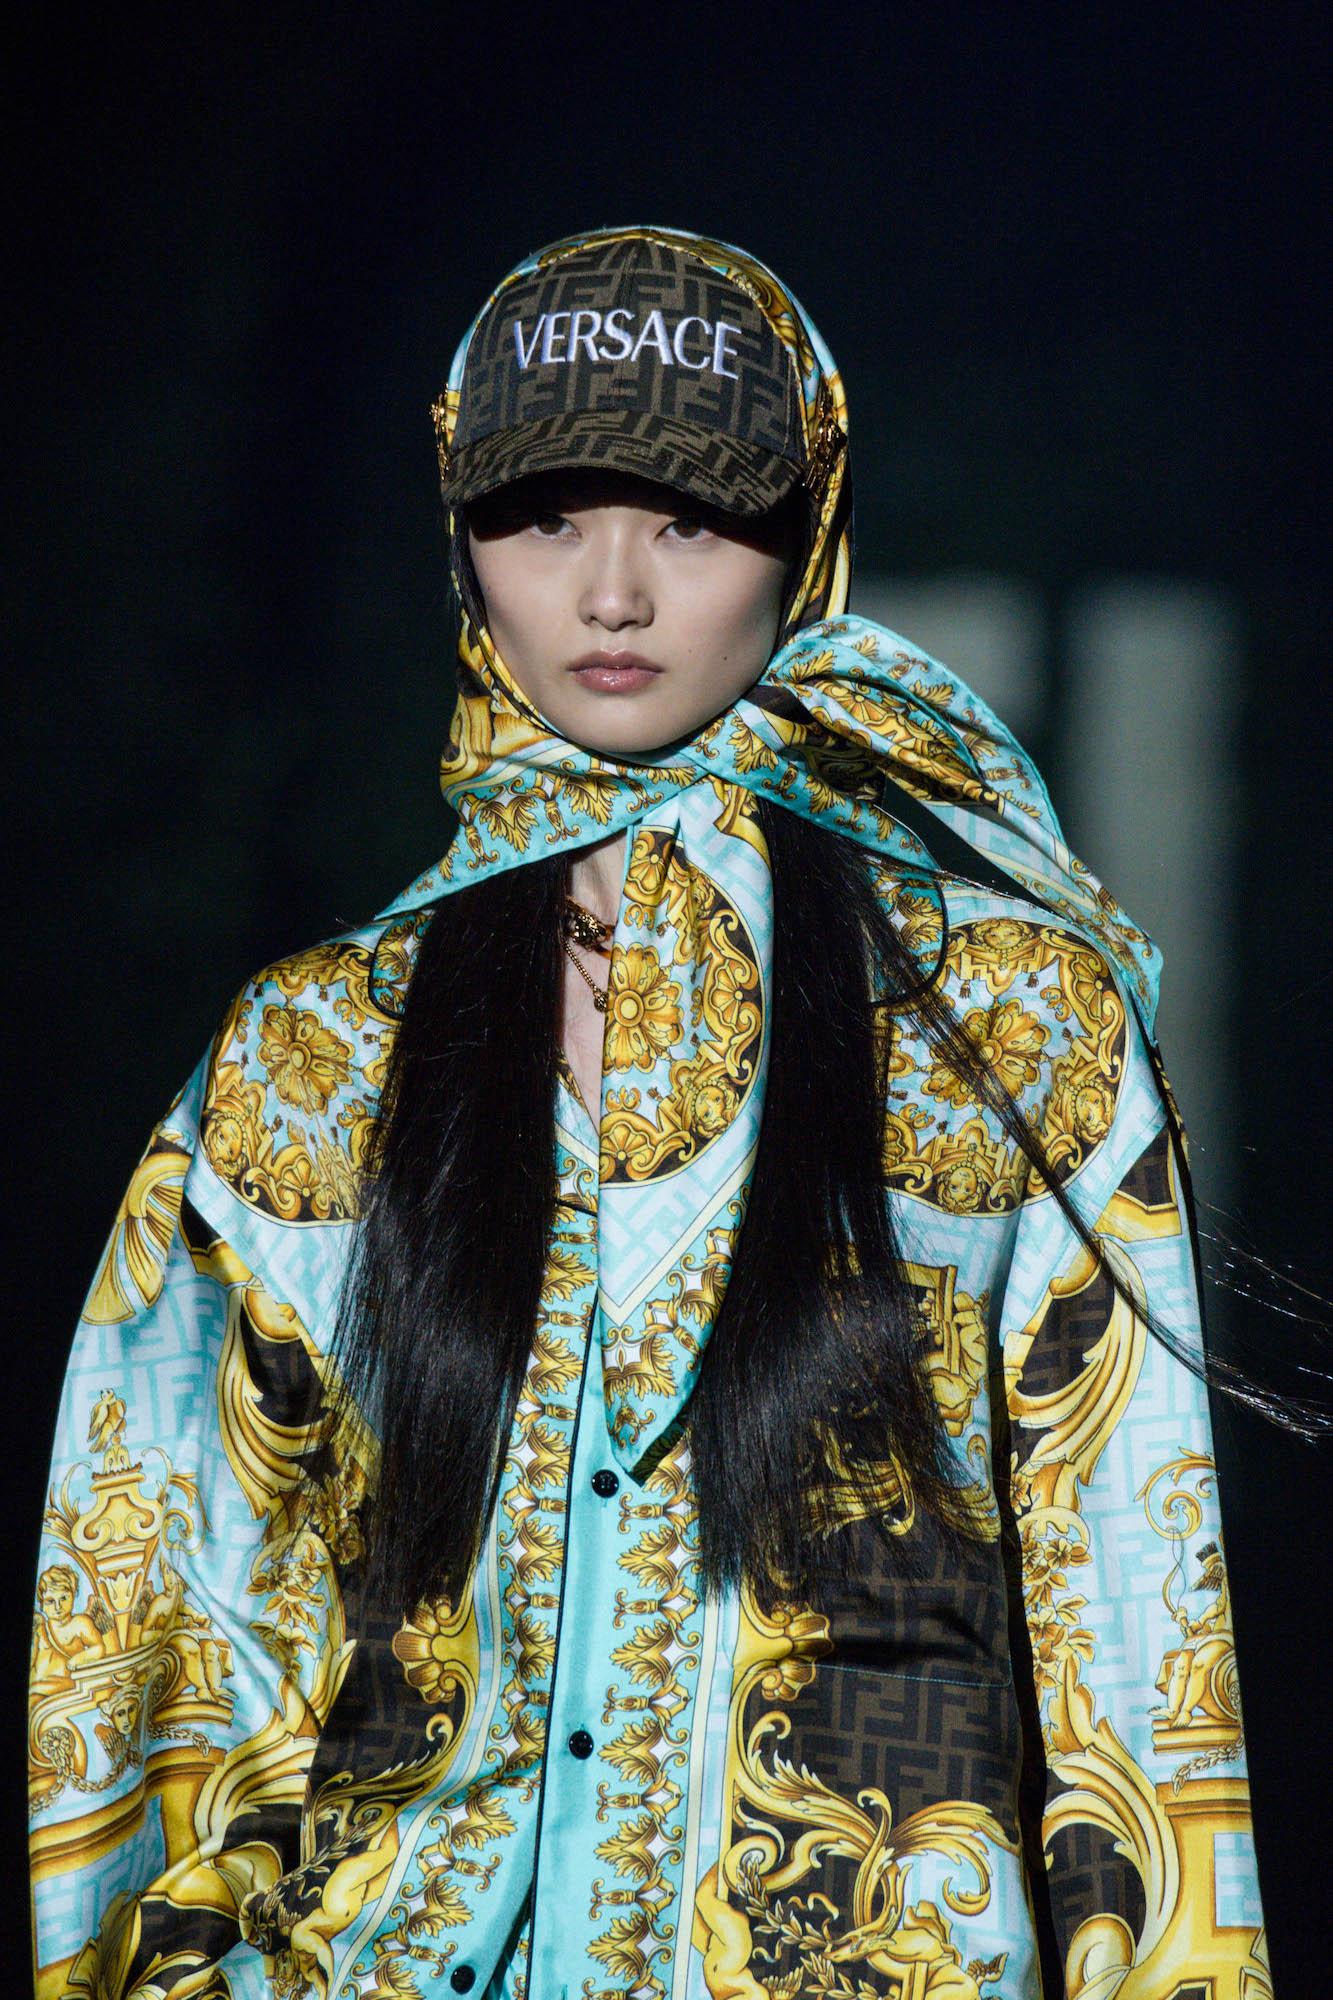 fendi by versace details (42)